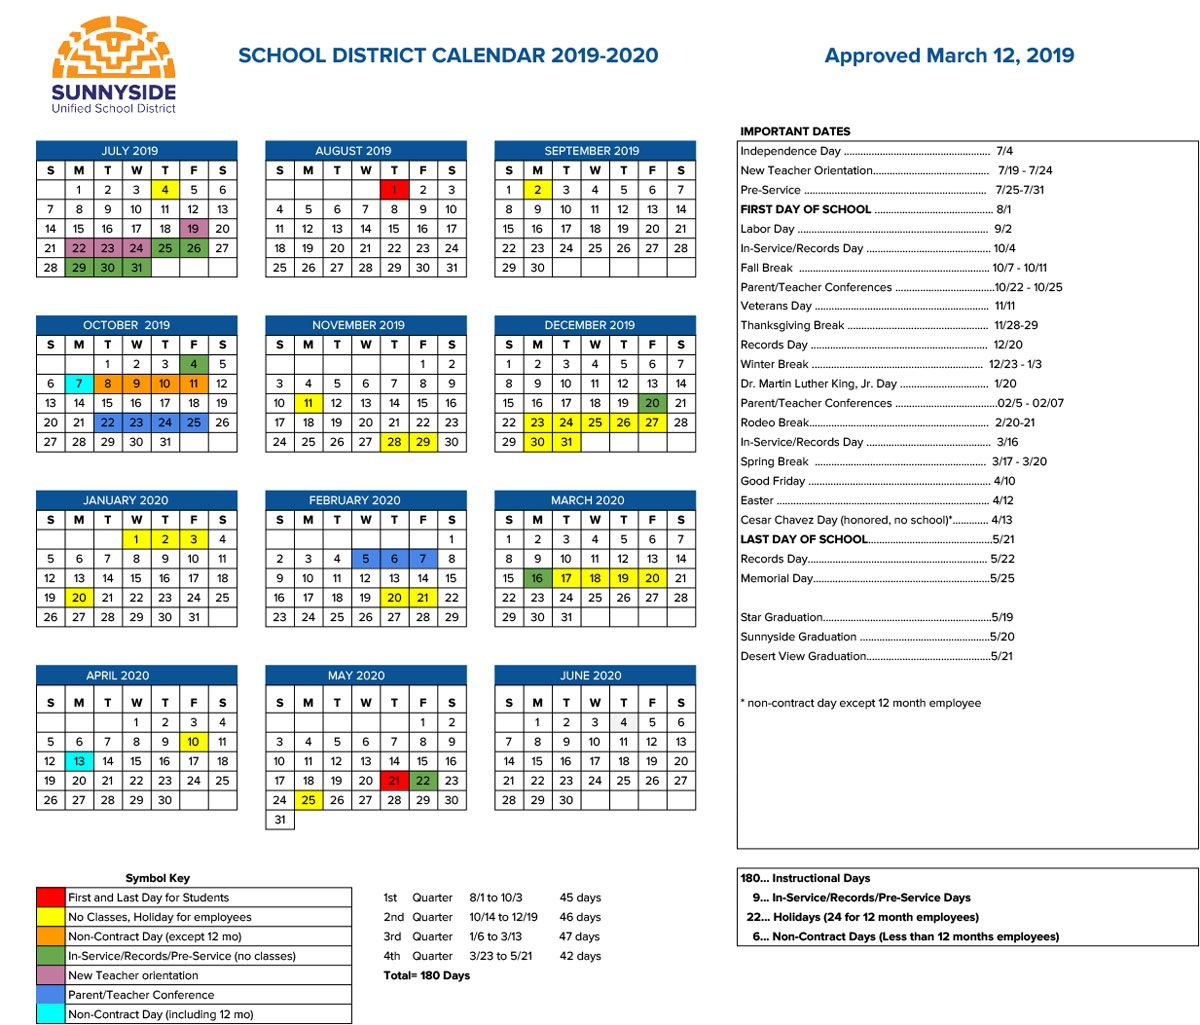 Gsu 2021-22 Calendar Gsu Summer 2021 Calendar